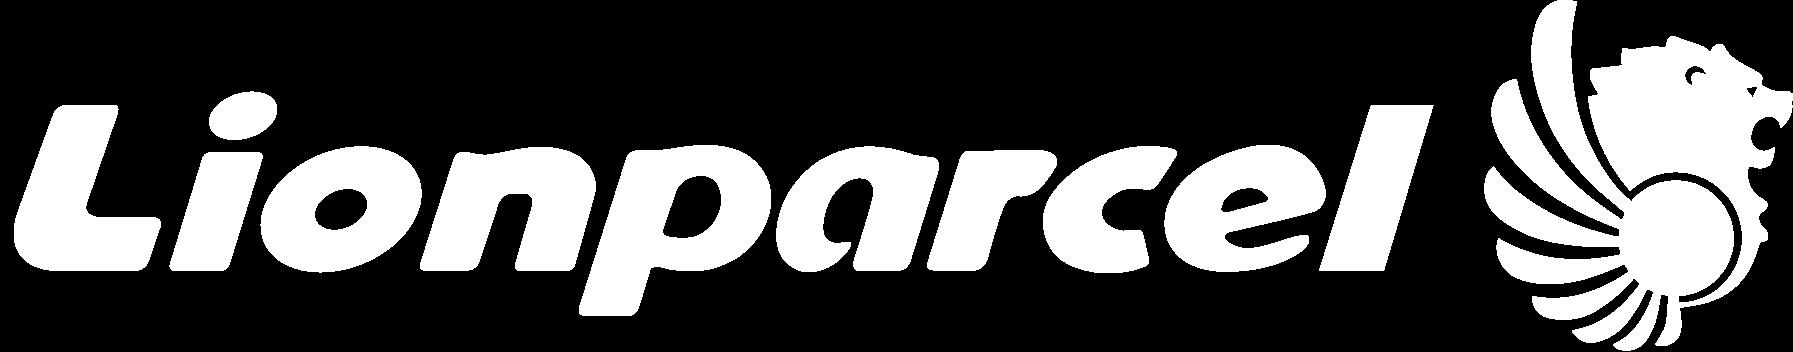 Jasa Pengiriman Paket dan Dokumen